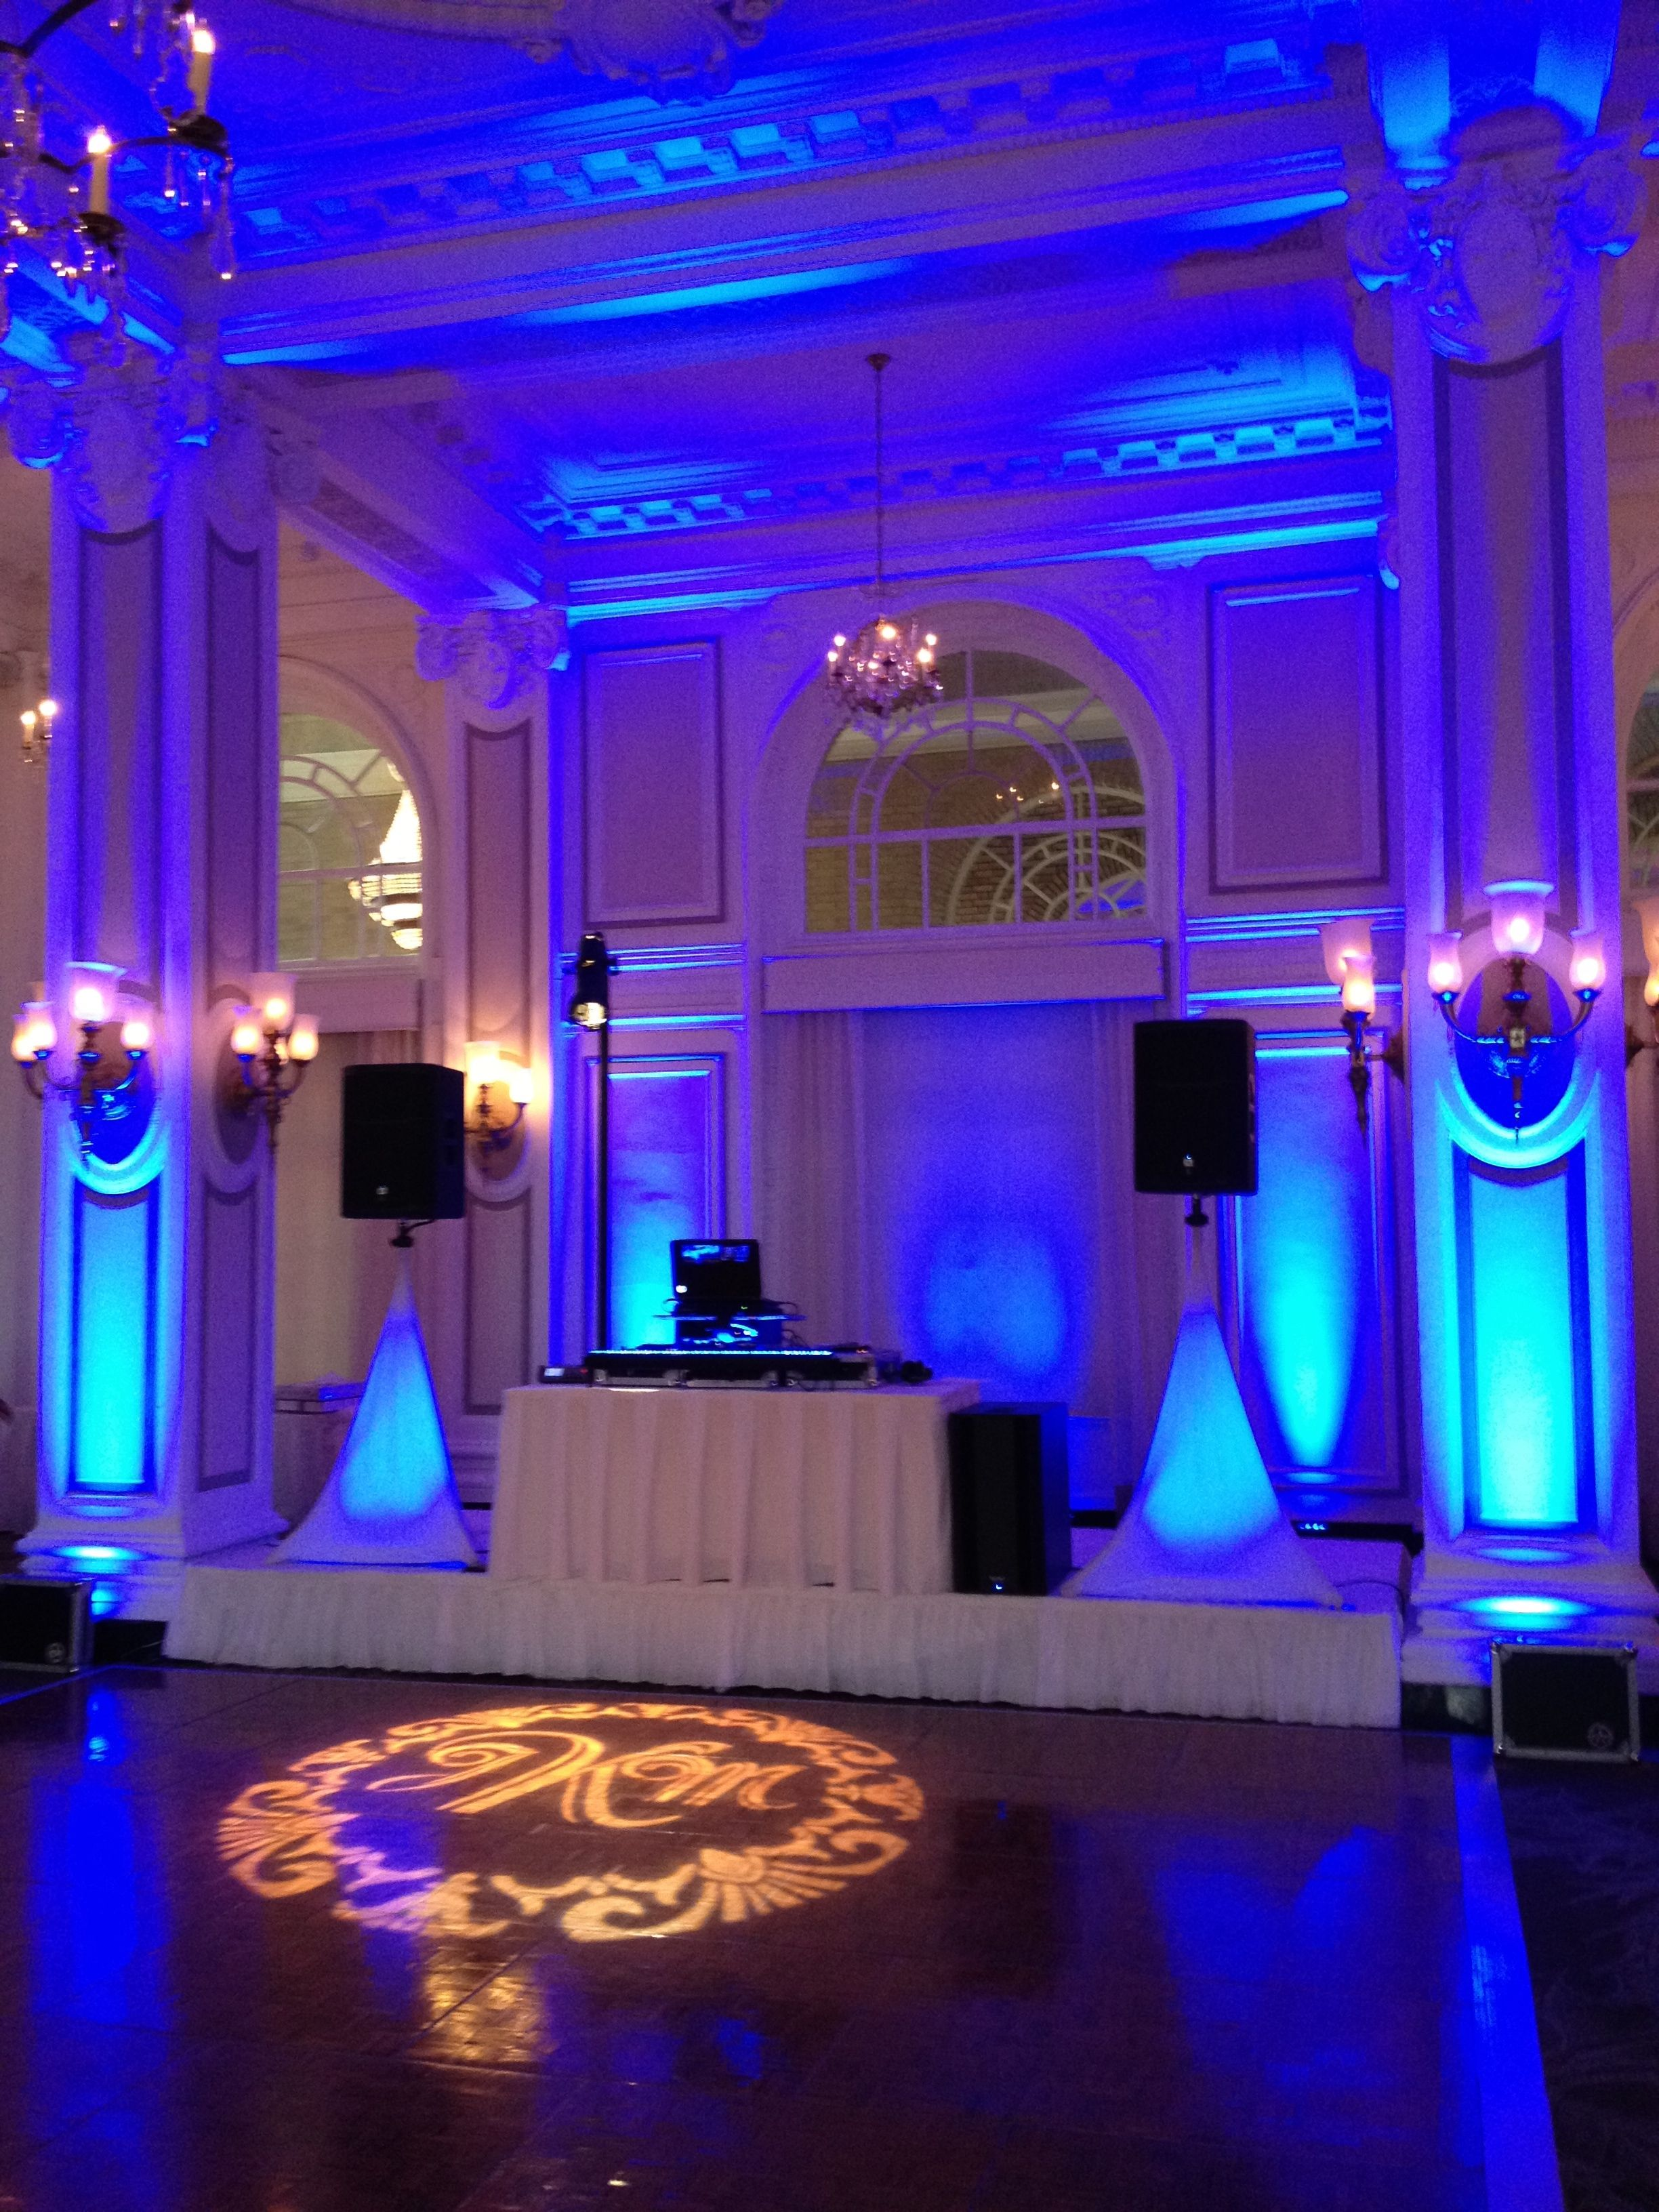 Photos Courtesy Of Fonix Entertainment Www Fonixentertainment Com Event Lighting Atlanta Wedding Dj Booth